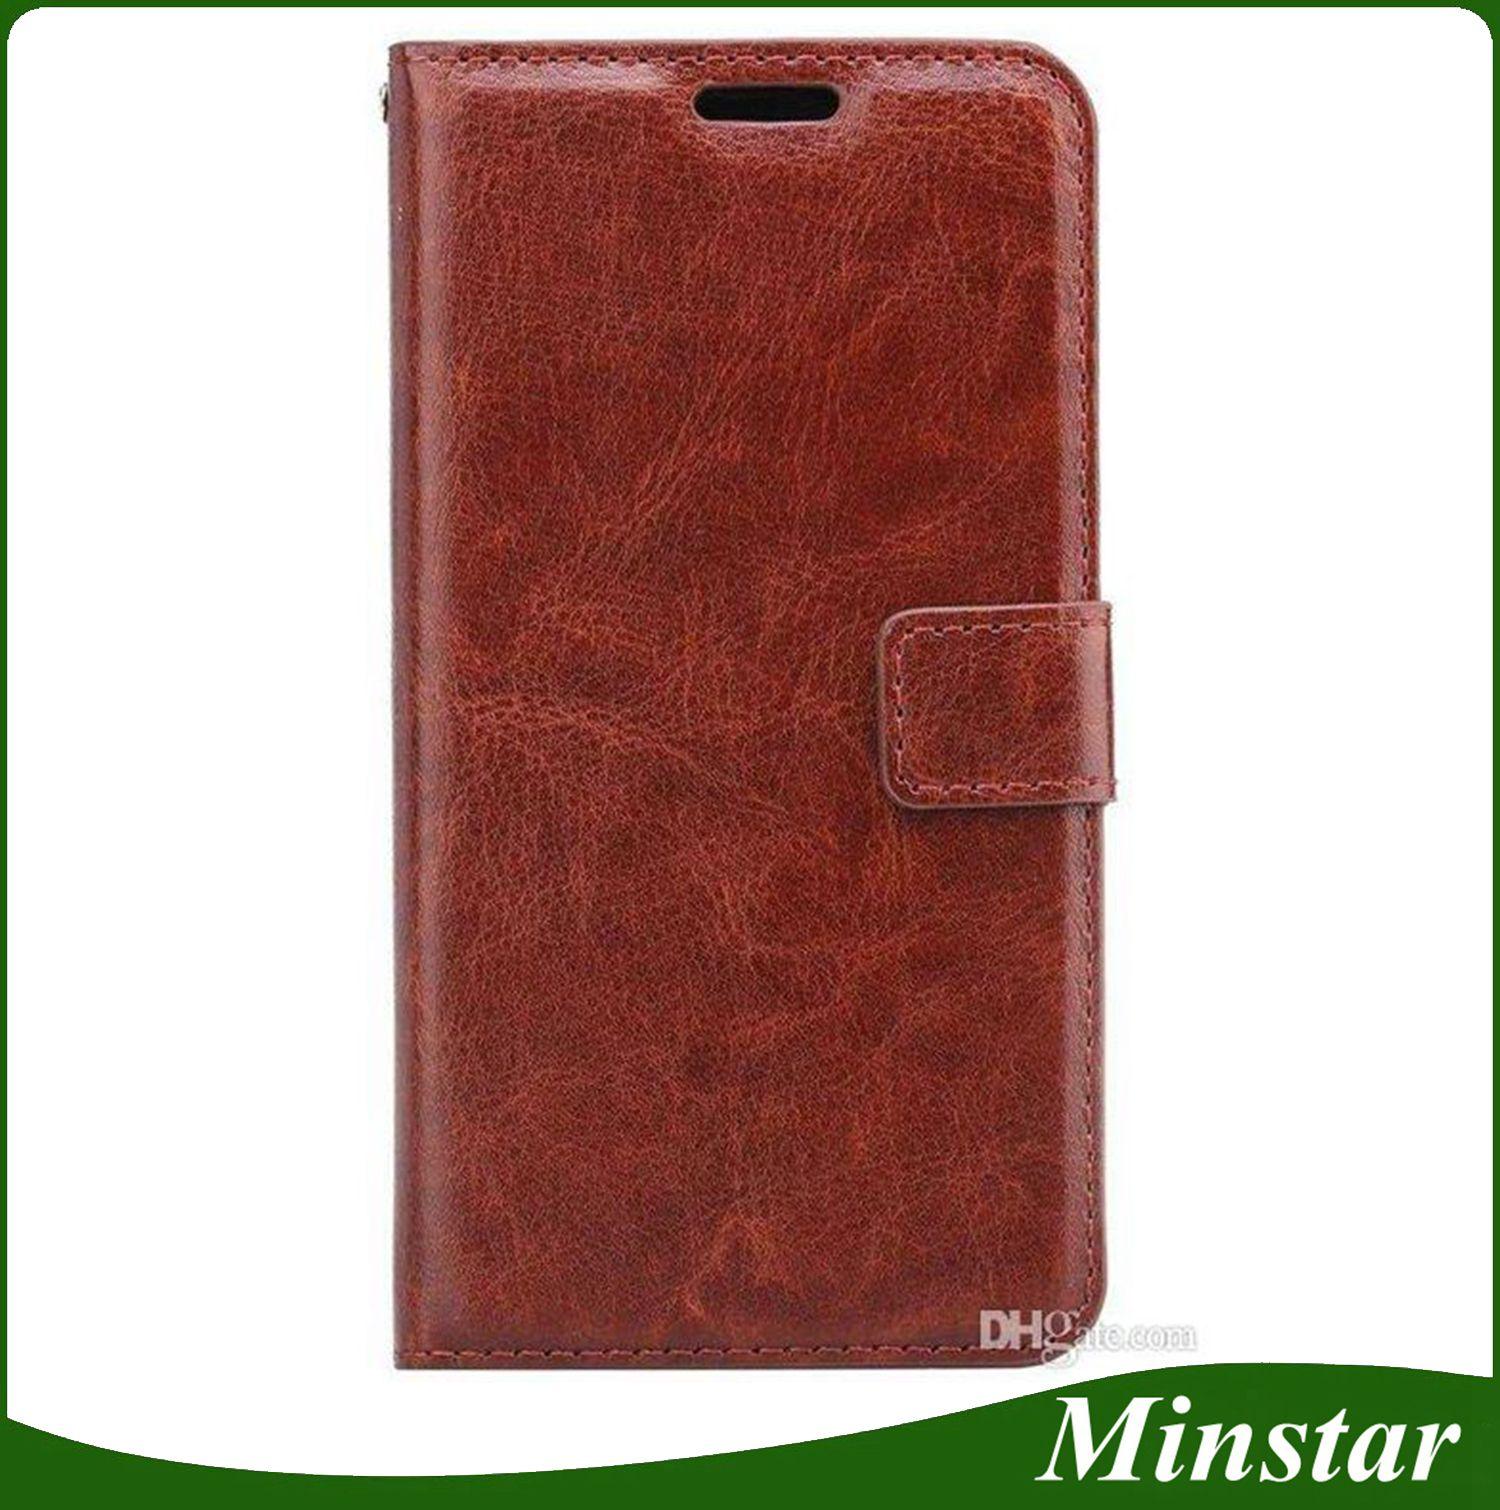 2018 Newest Model Mobile Wallet Leather Case for ZTE Warp 8 N9517 Warp 7  Z981 ZMax Pro 2 Z982 LG Aristo 2 X210 Flip Magnetic Case